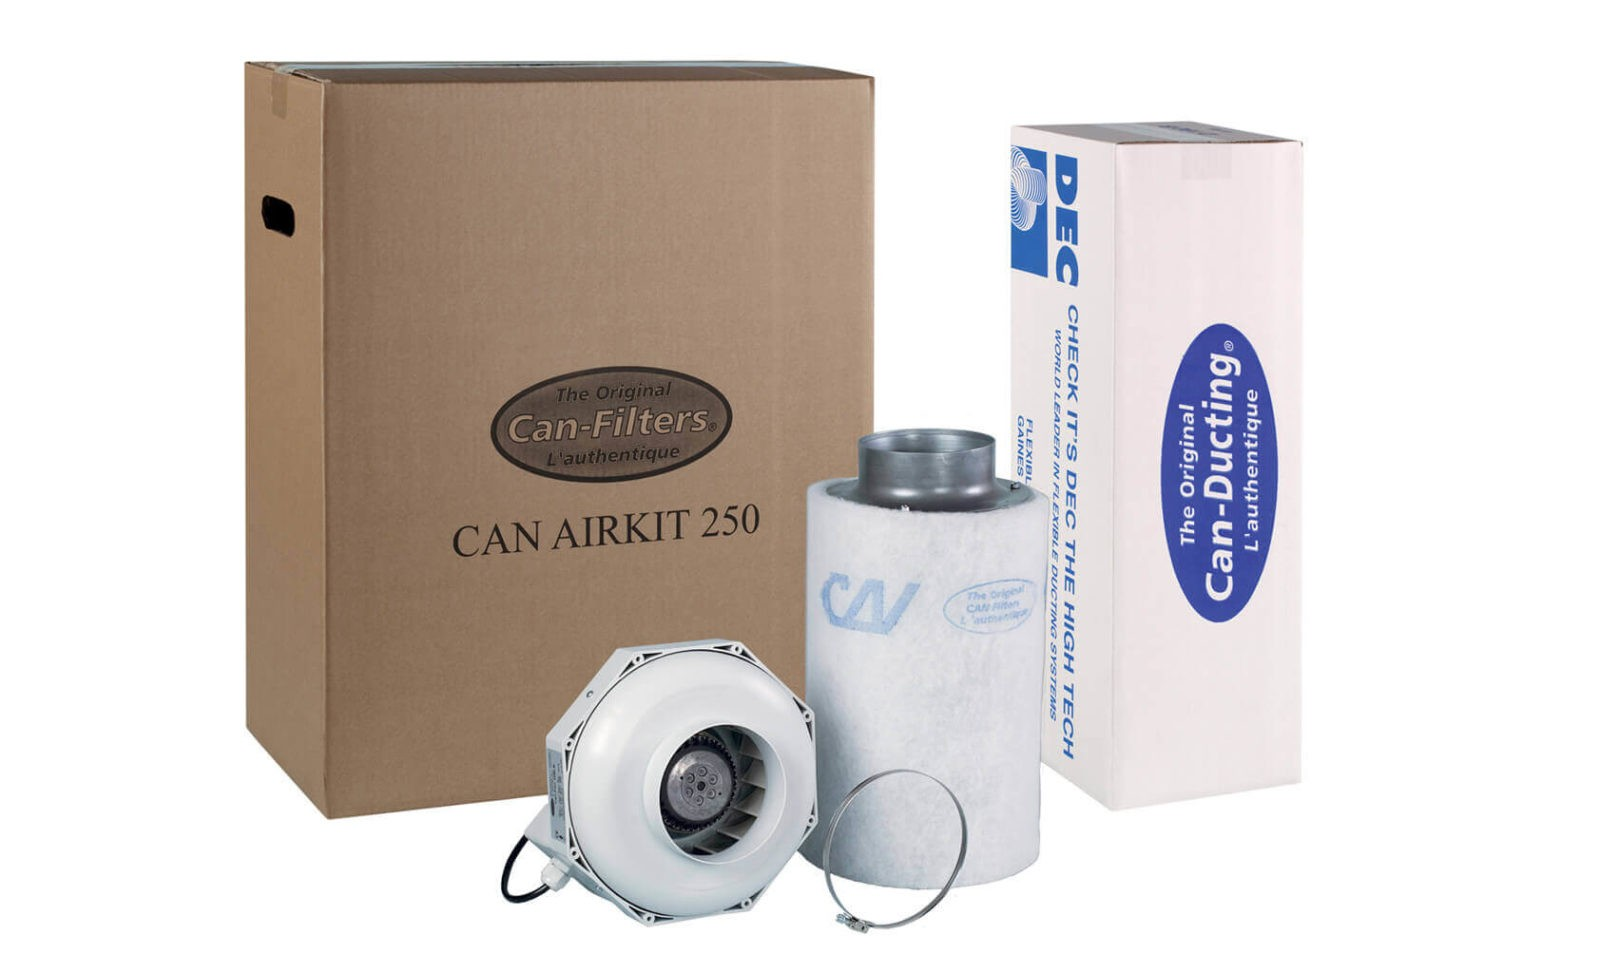 Ventilacijski kompleti na AKCIJI -10%